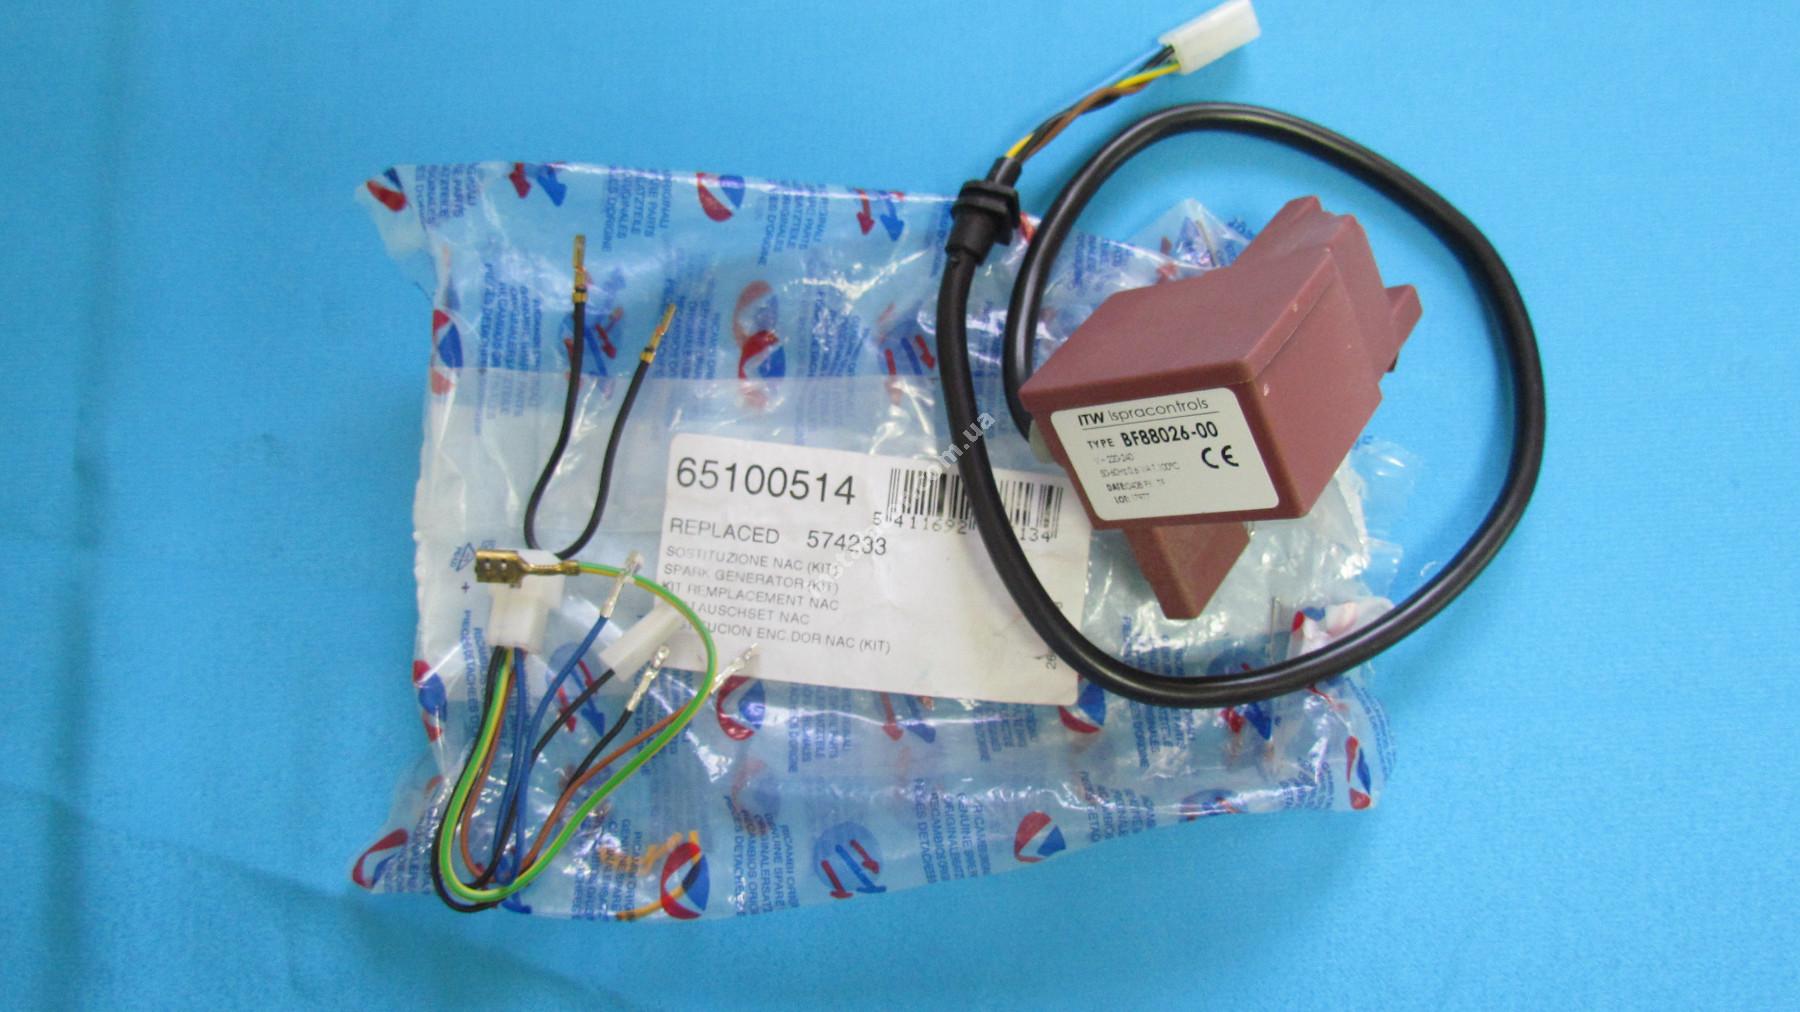 65100514 Генератор іскри ARISTON  full-image-1